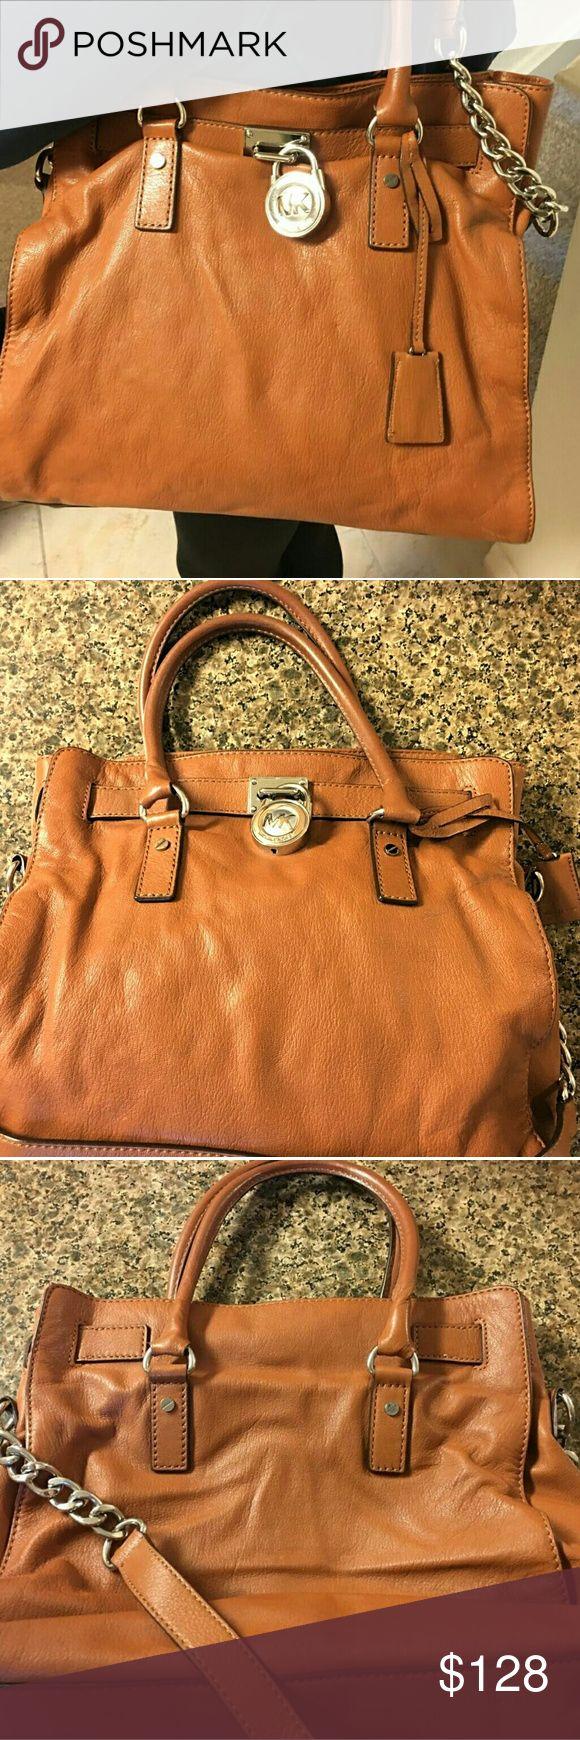 Michael Kors Hamilton Soft Leather Camel Bag Michael Kors Hamilton Soft Leather Camel Bag Michael Kors Bags Satchels